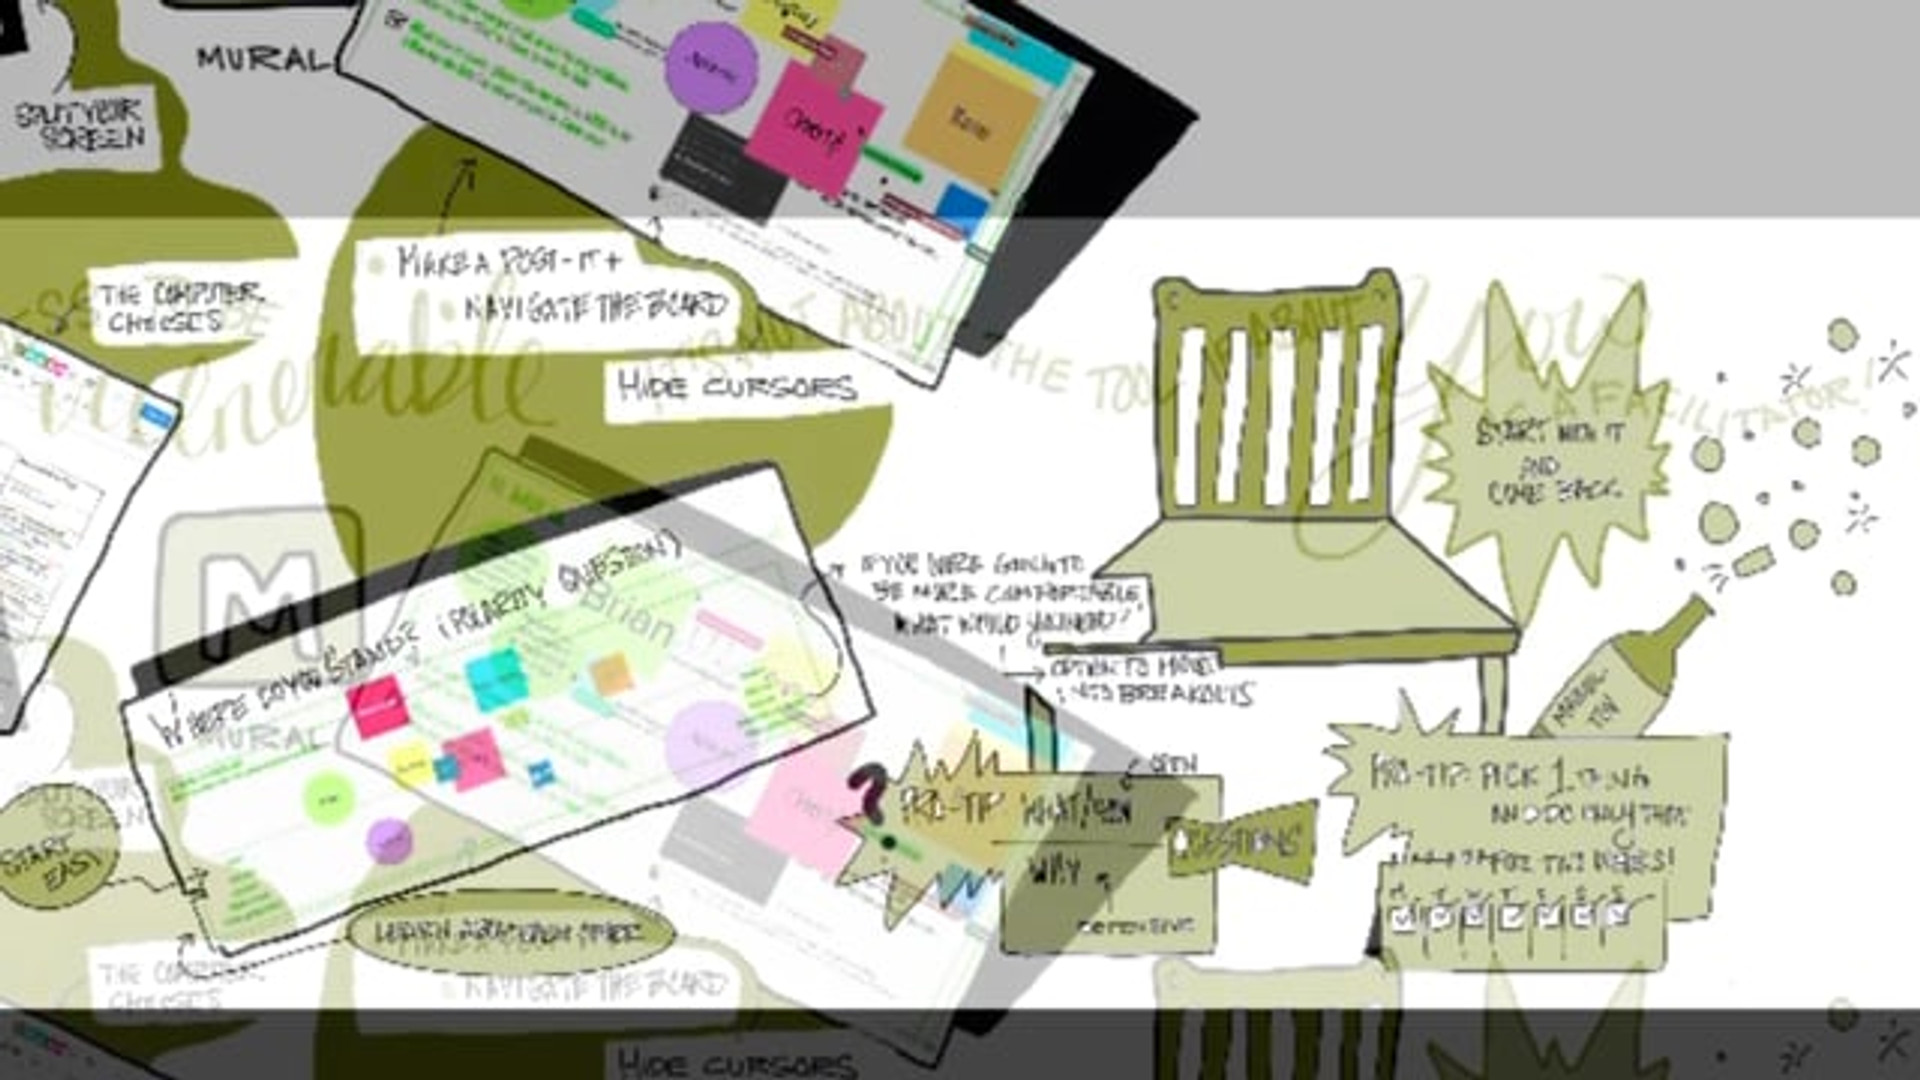 Virtual Facilitation Workshop